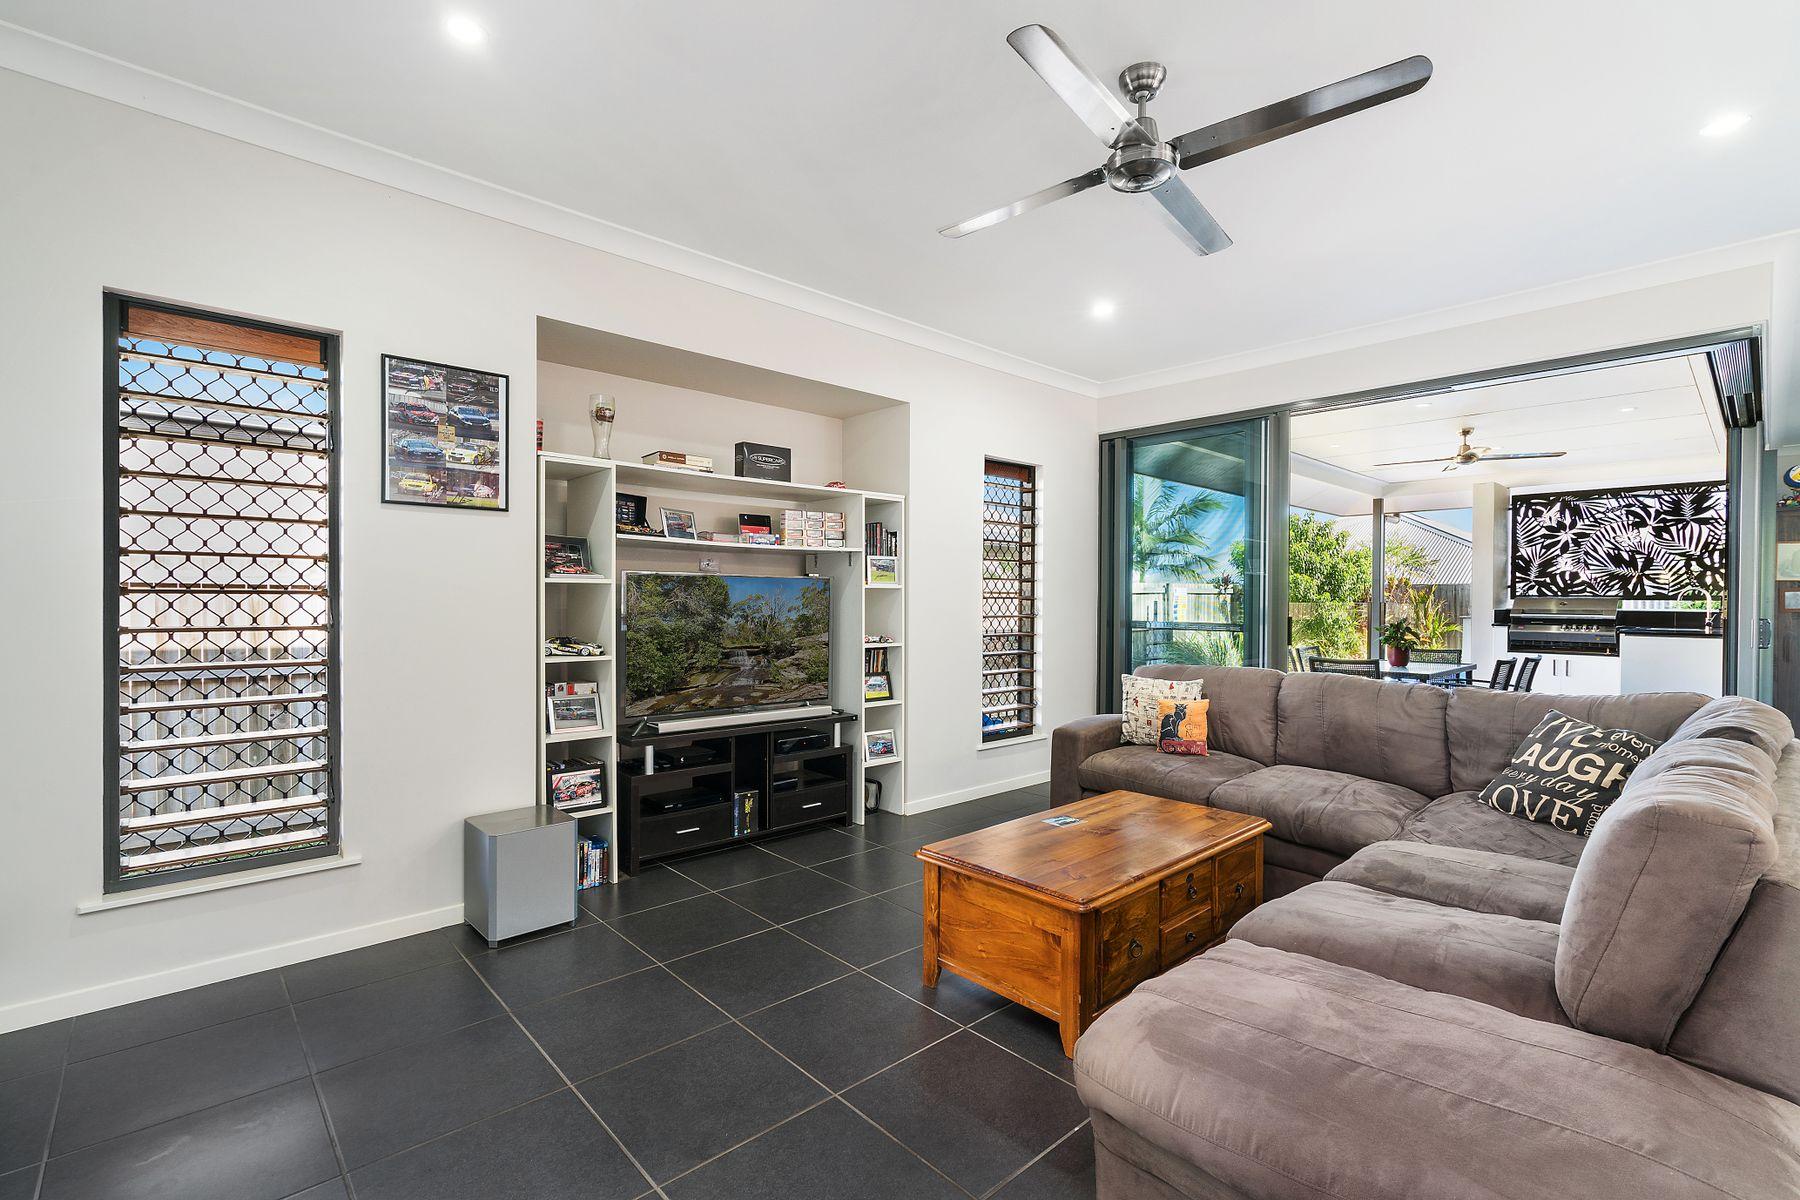 14 Chandos Brace, Smithfield, QLD 4878